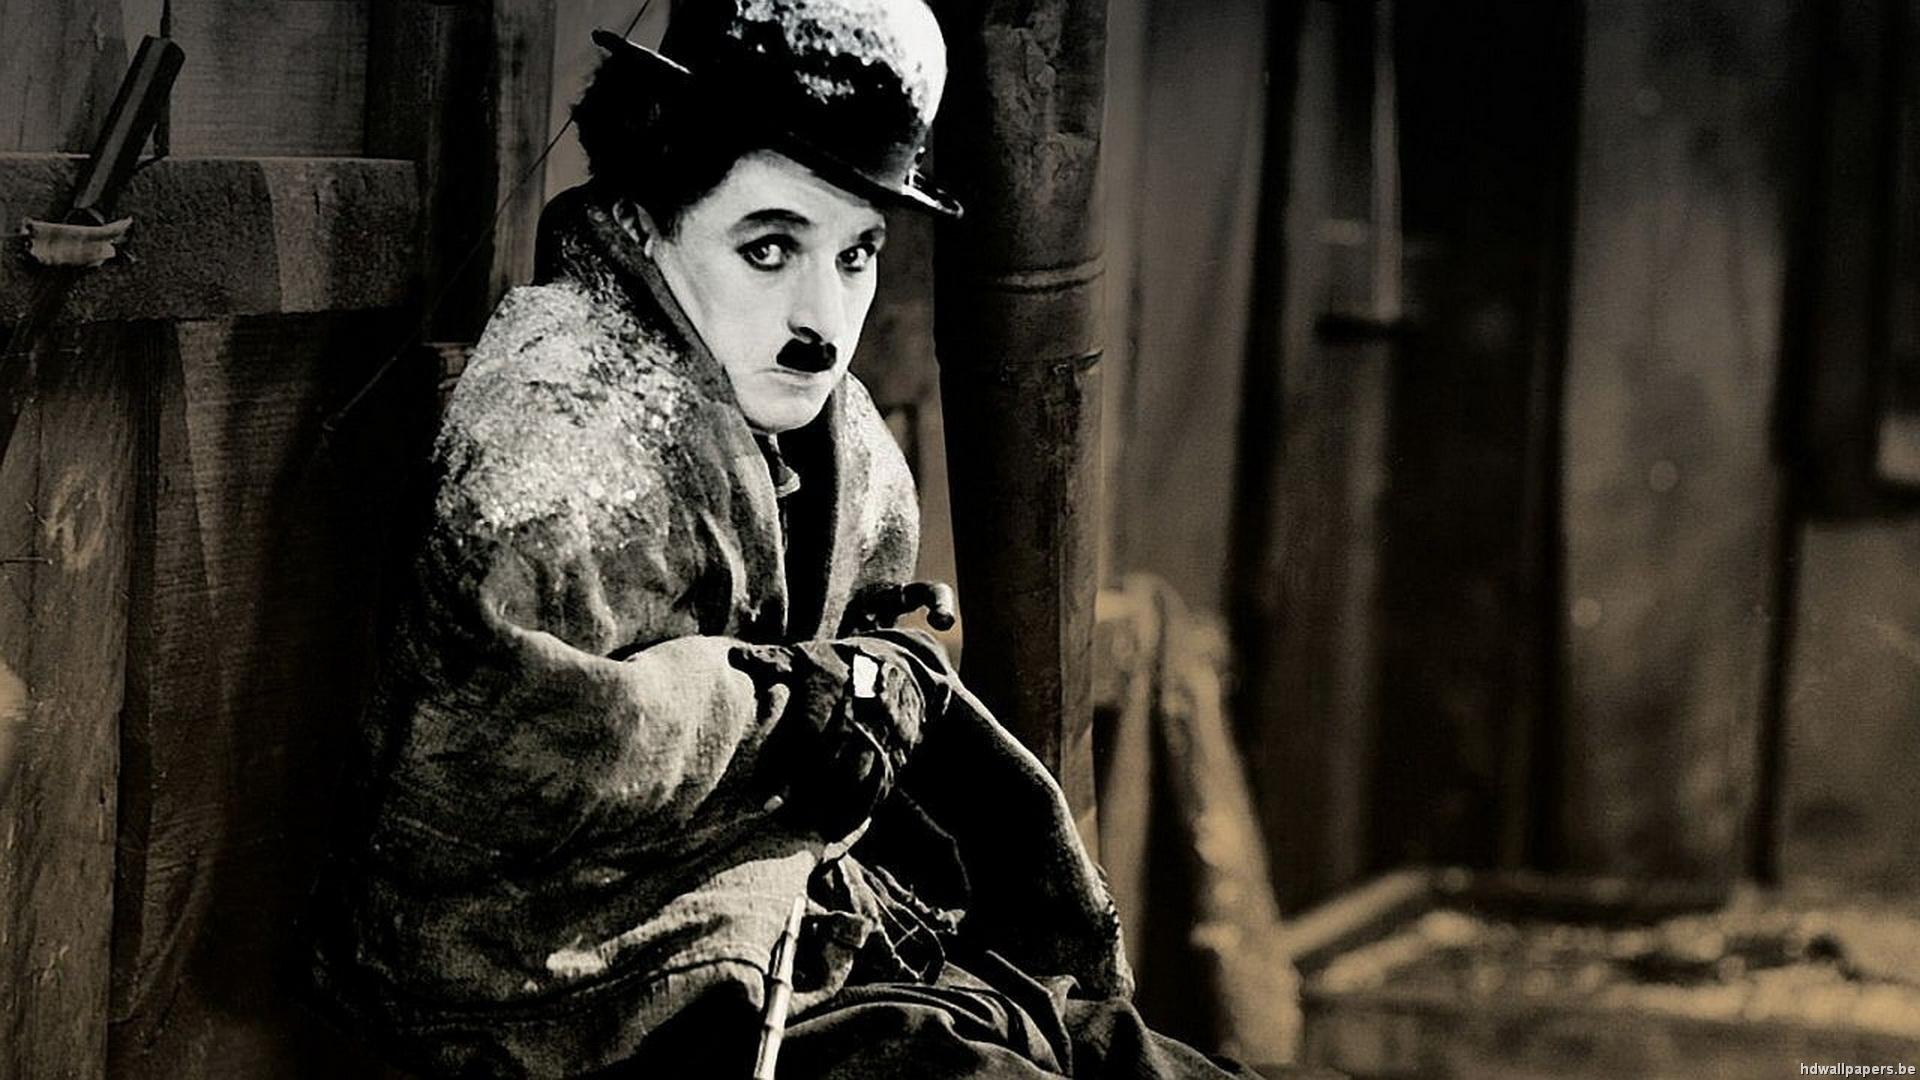 Charlie Chaplin Wallpapers Charlie Chaplin Wallpaper 5 1920x1080 1920x1080